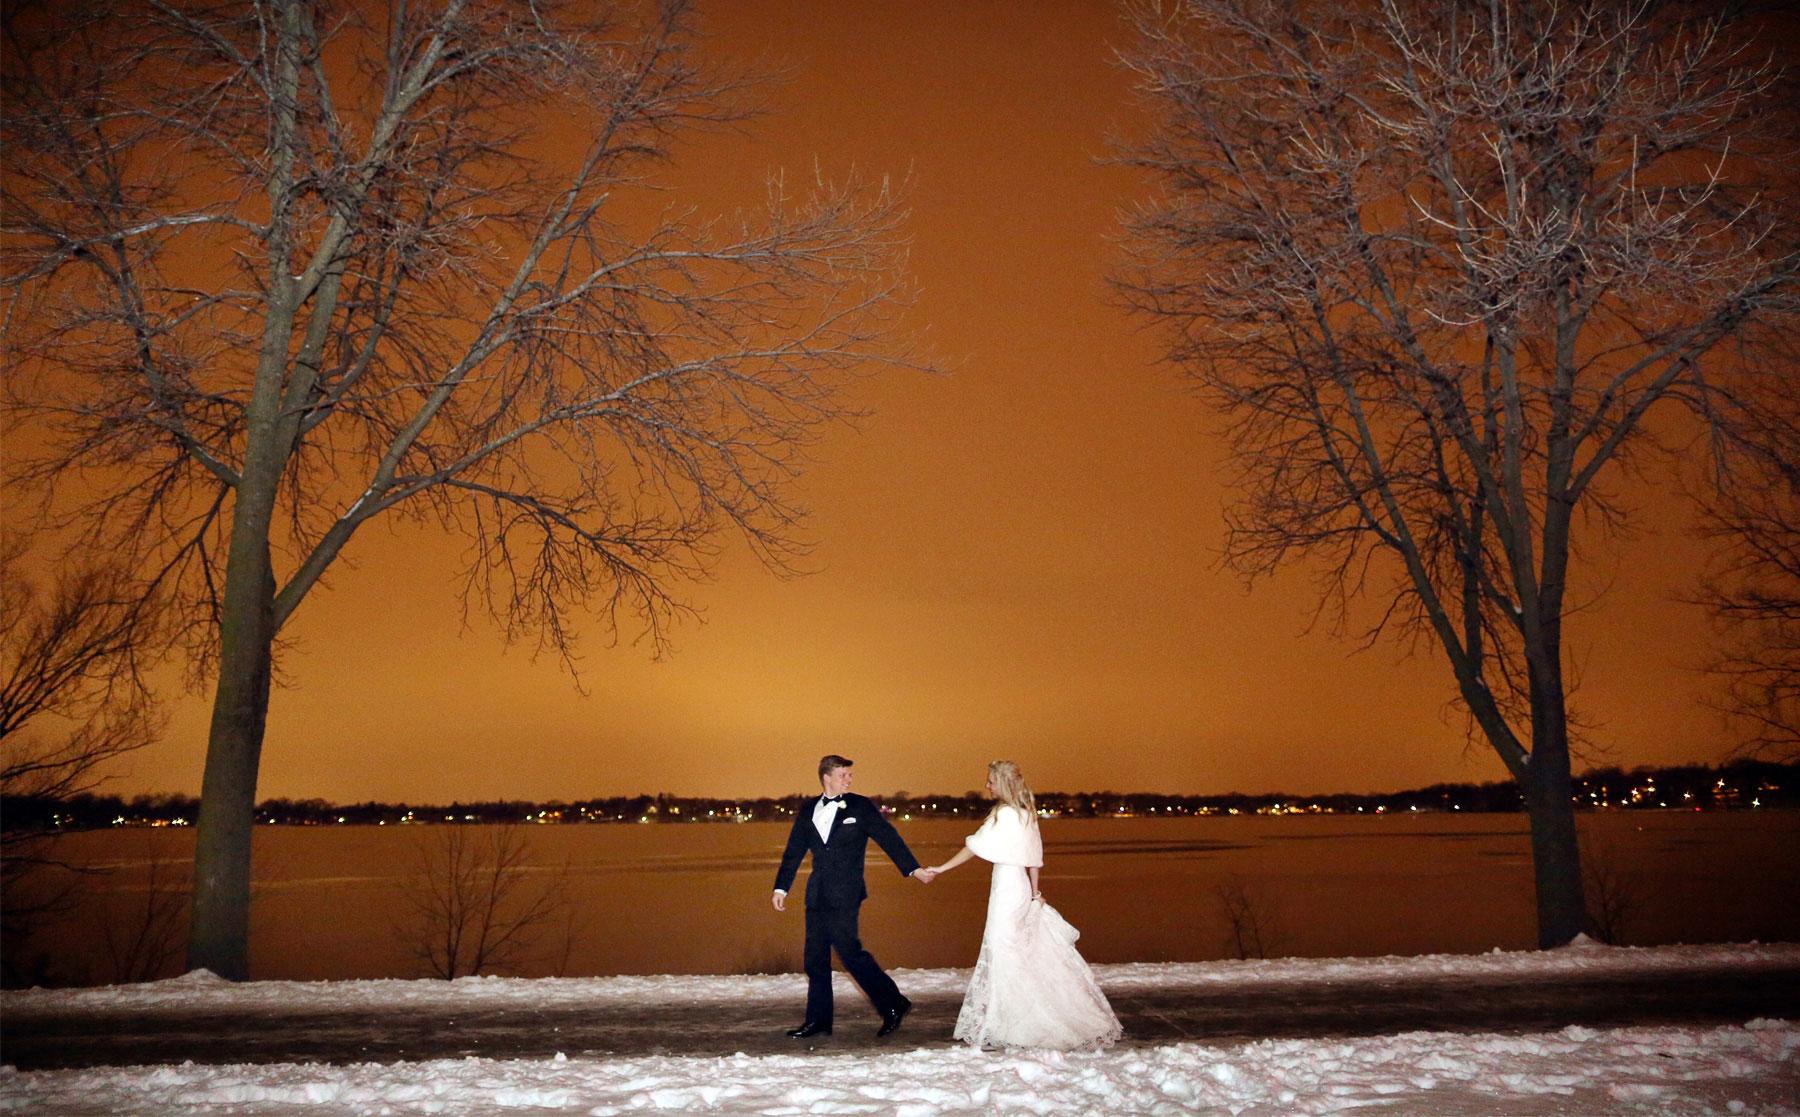 15-Minneapolis-Minnesota-Wedding-Photography-by-Vick-Photography-Winter-Outdoor-Caroline-and-J.jpg